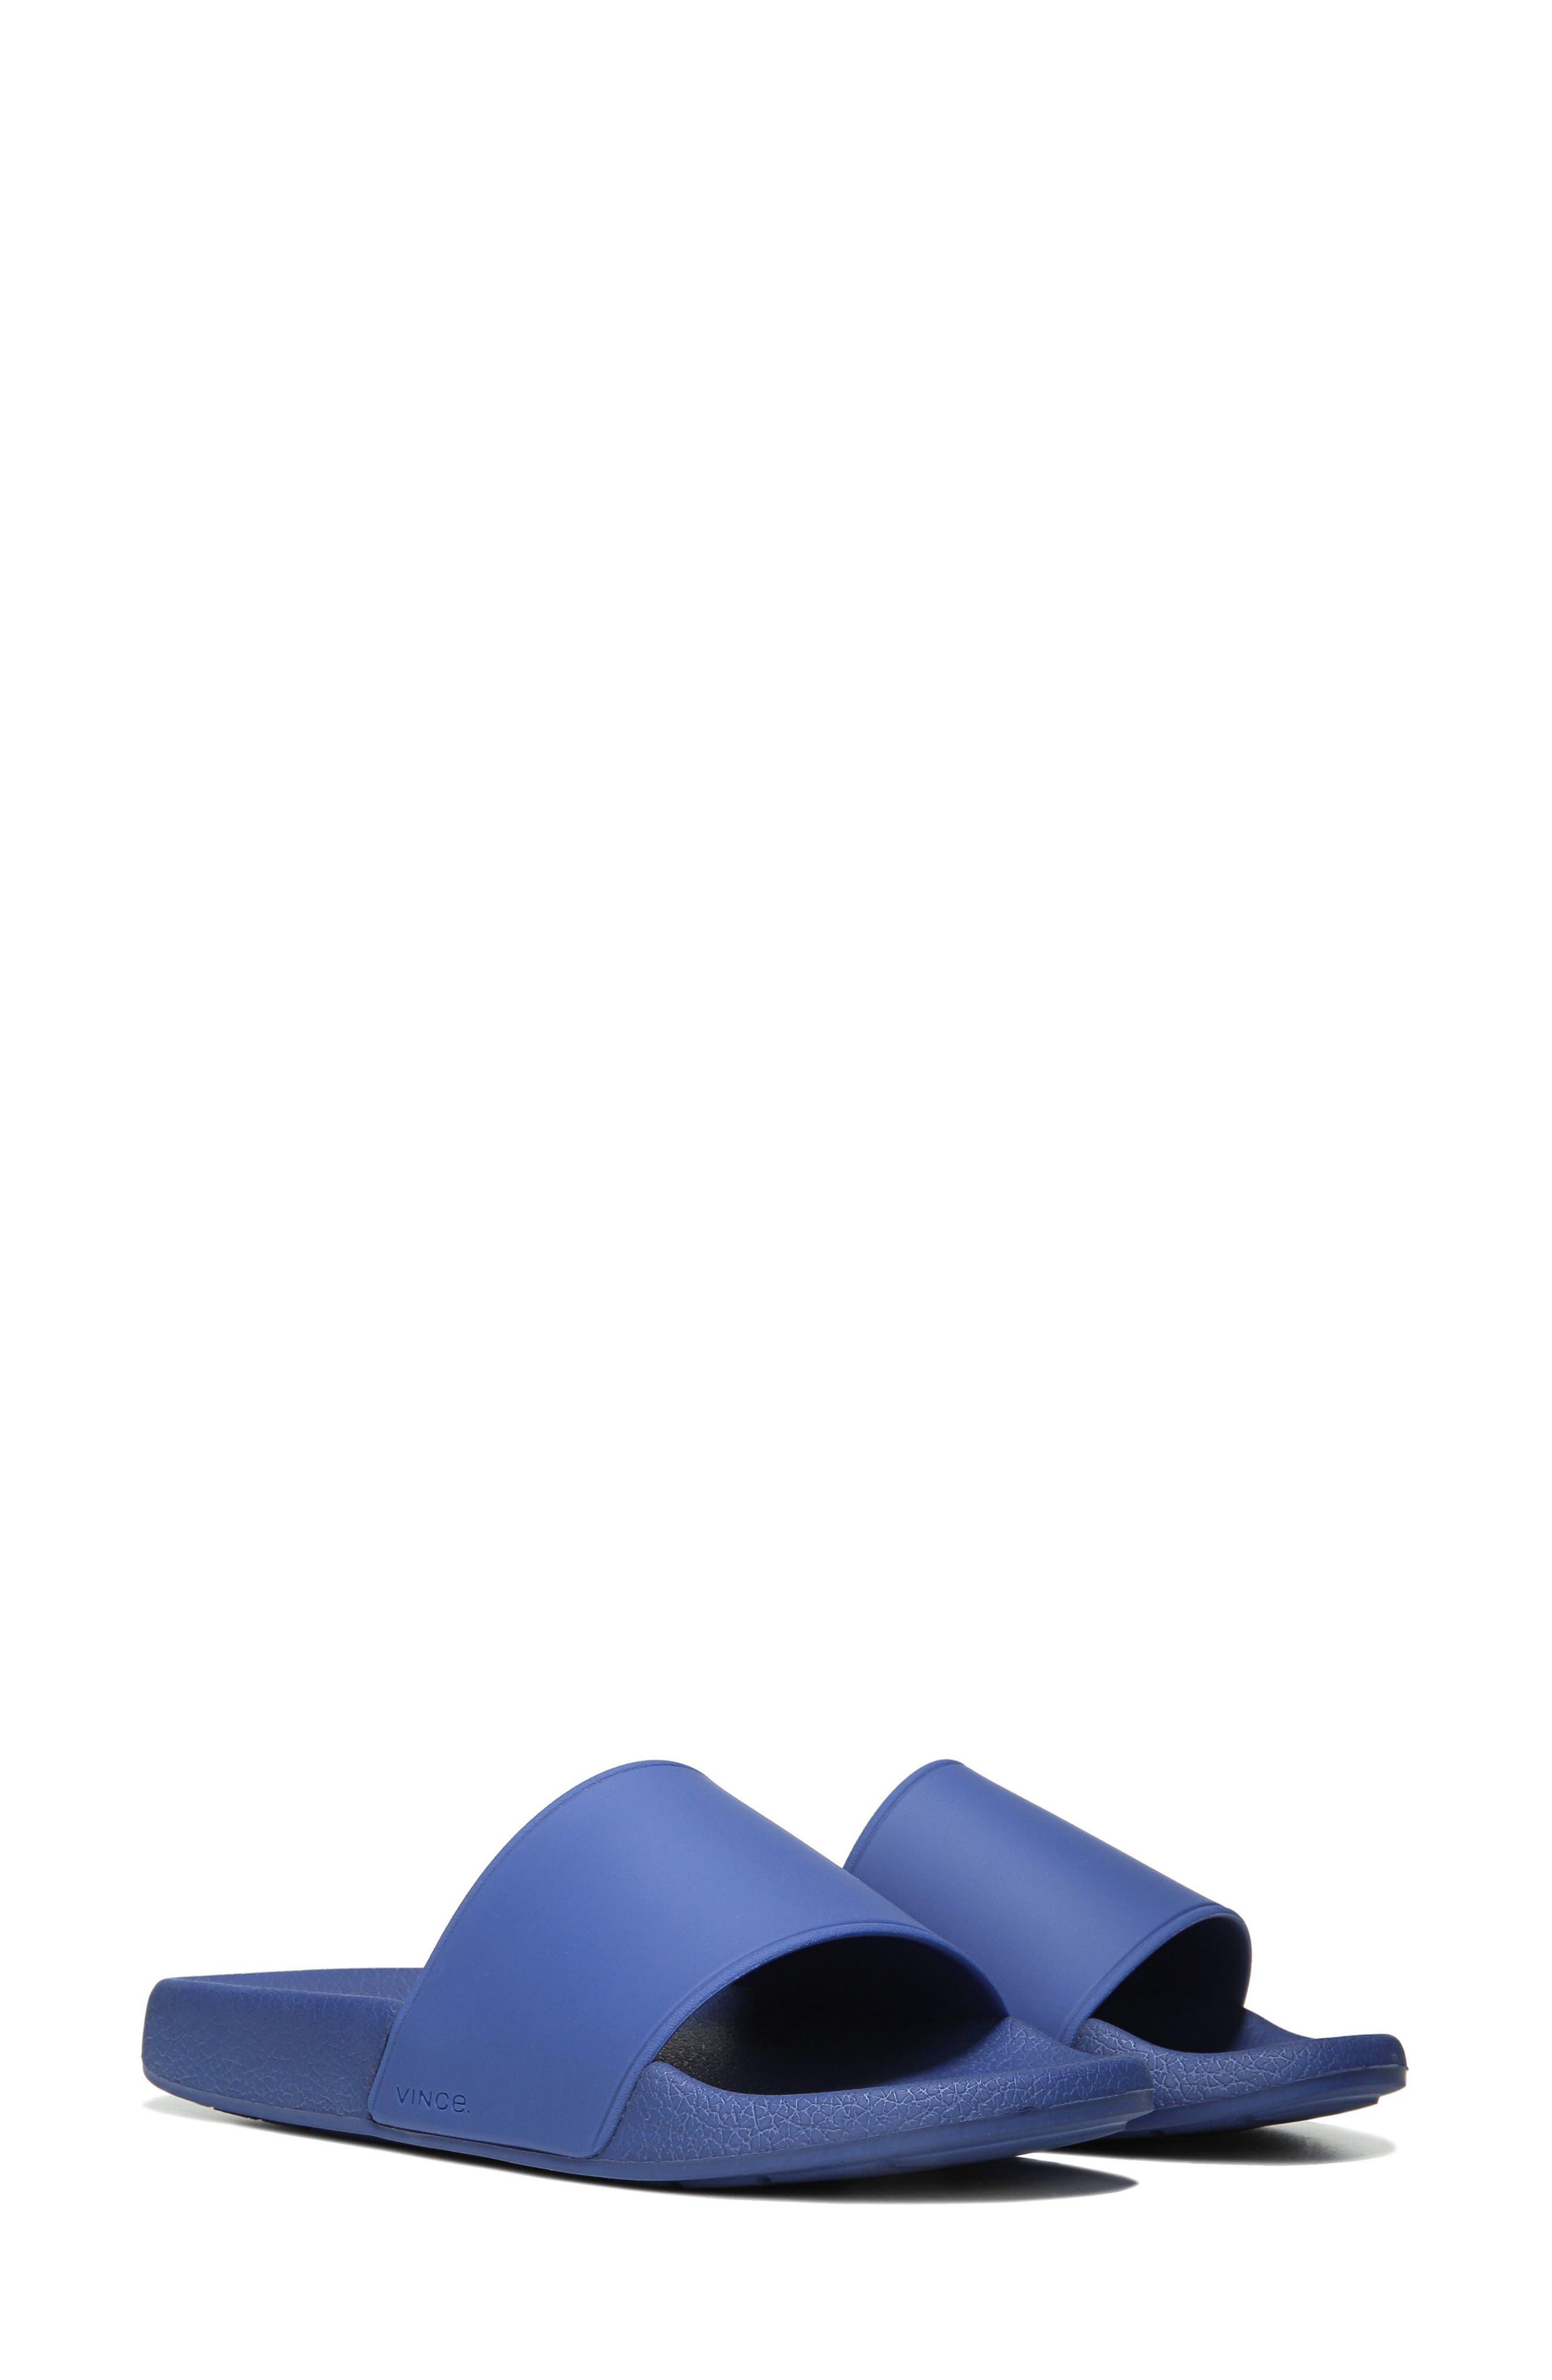 Westcoast Slide Sandal,                             Alternate thumbnail 54, color,